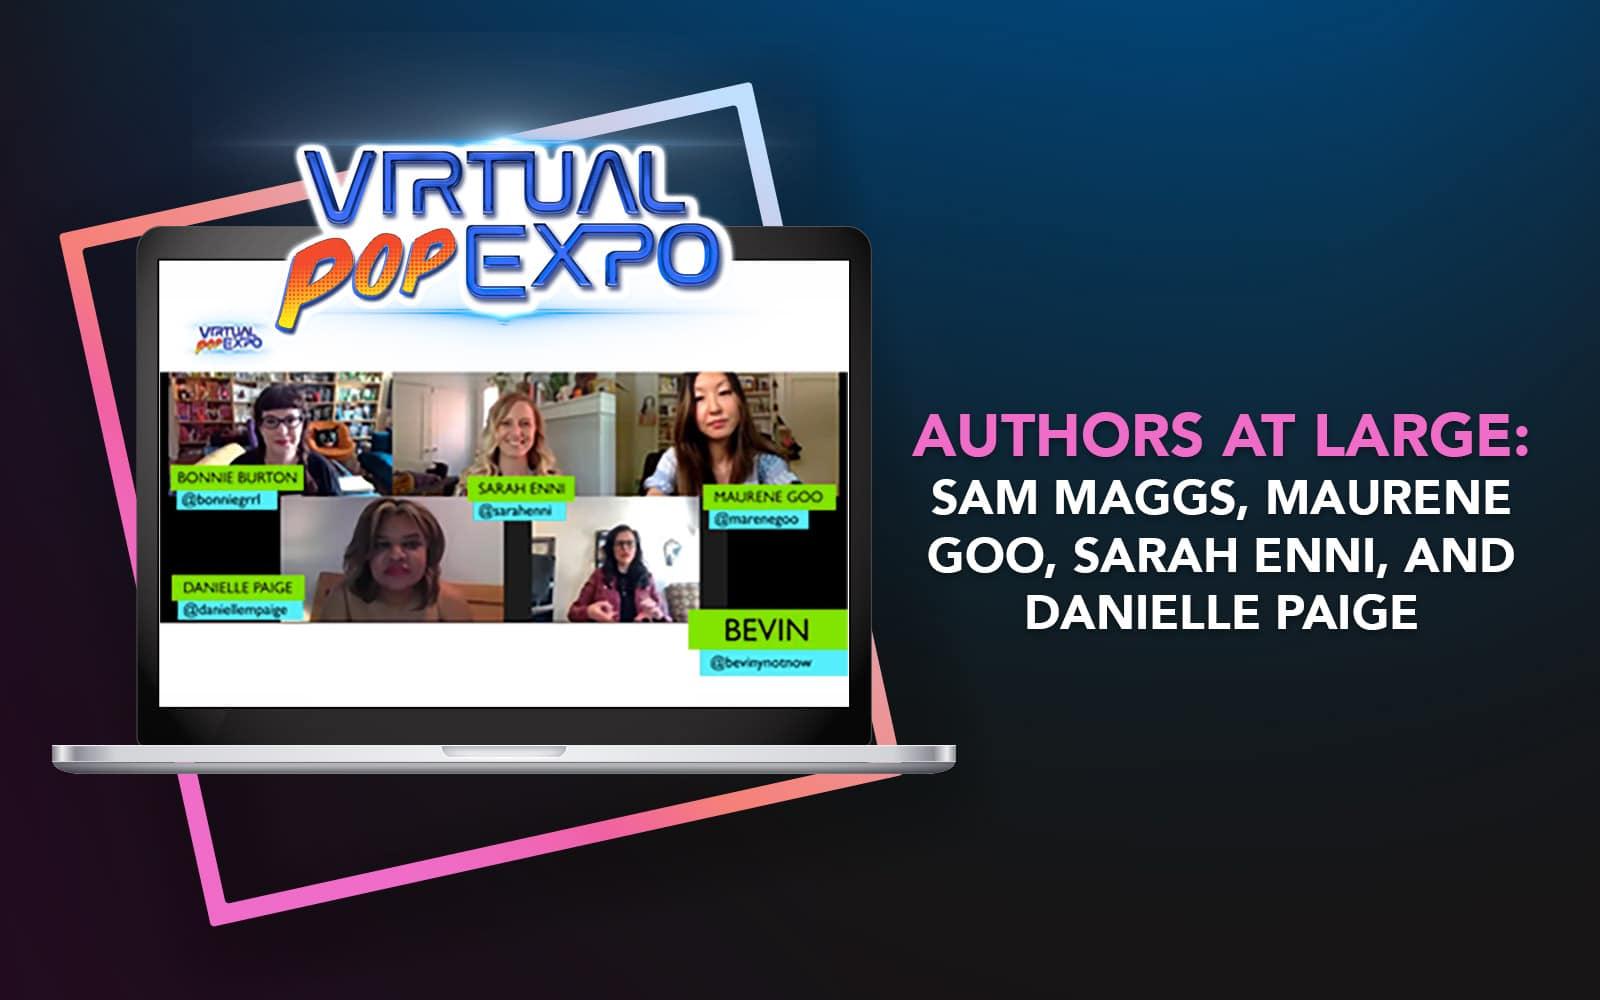 Authors at Large: Sam Maggs, Maurene Goo, Sarah Enni, and Danielle Paige